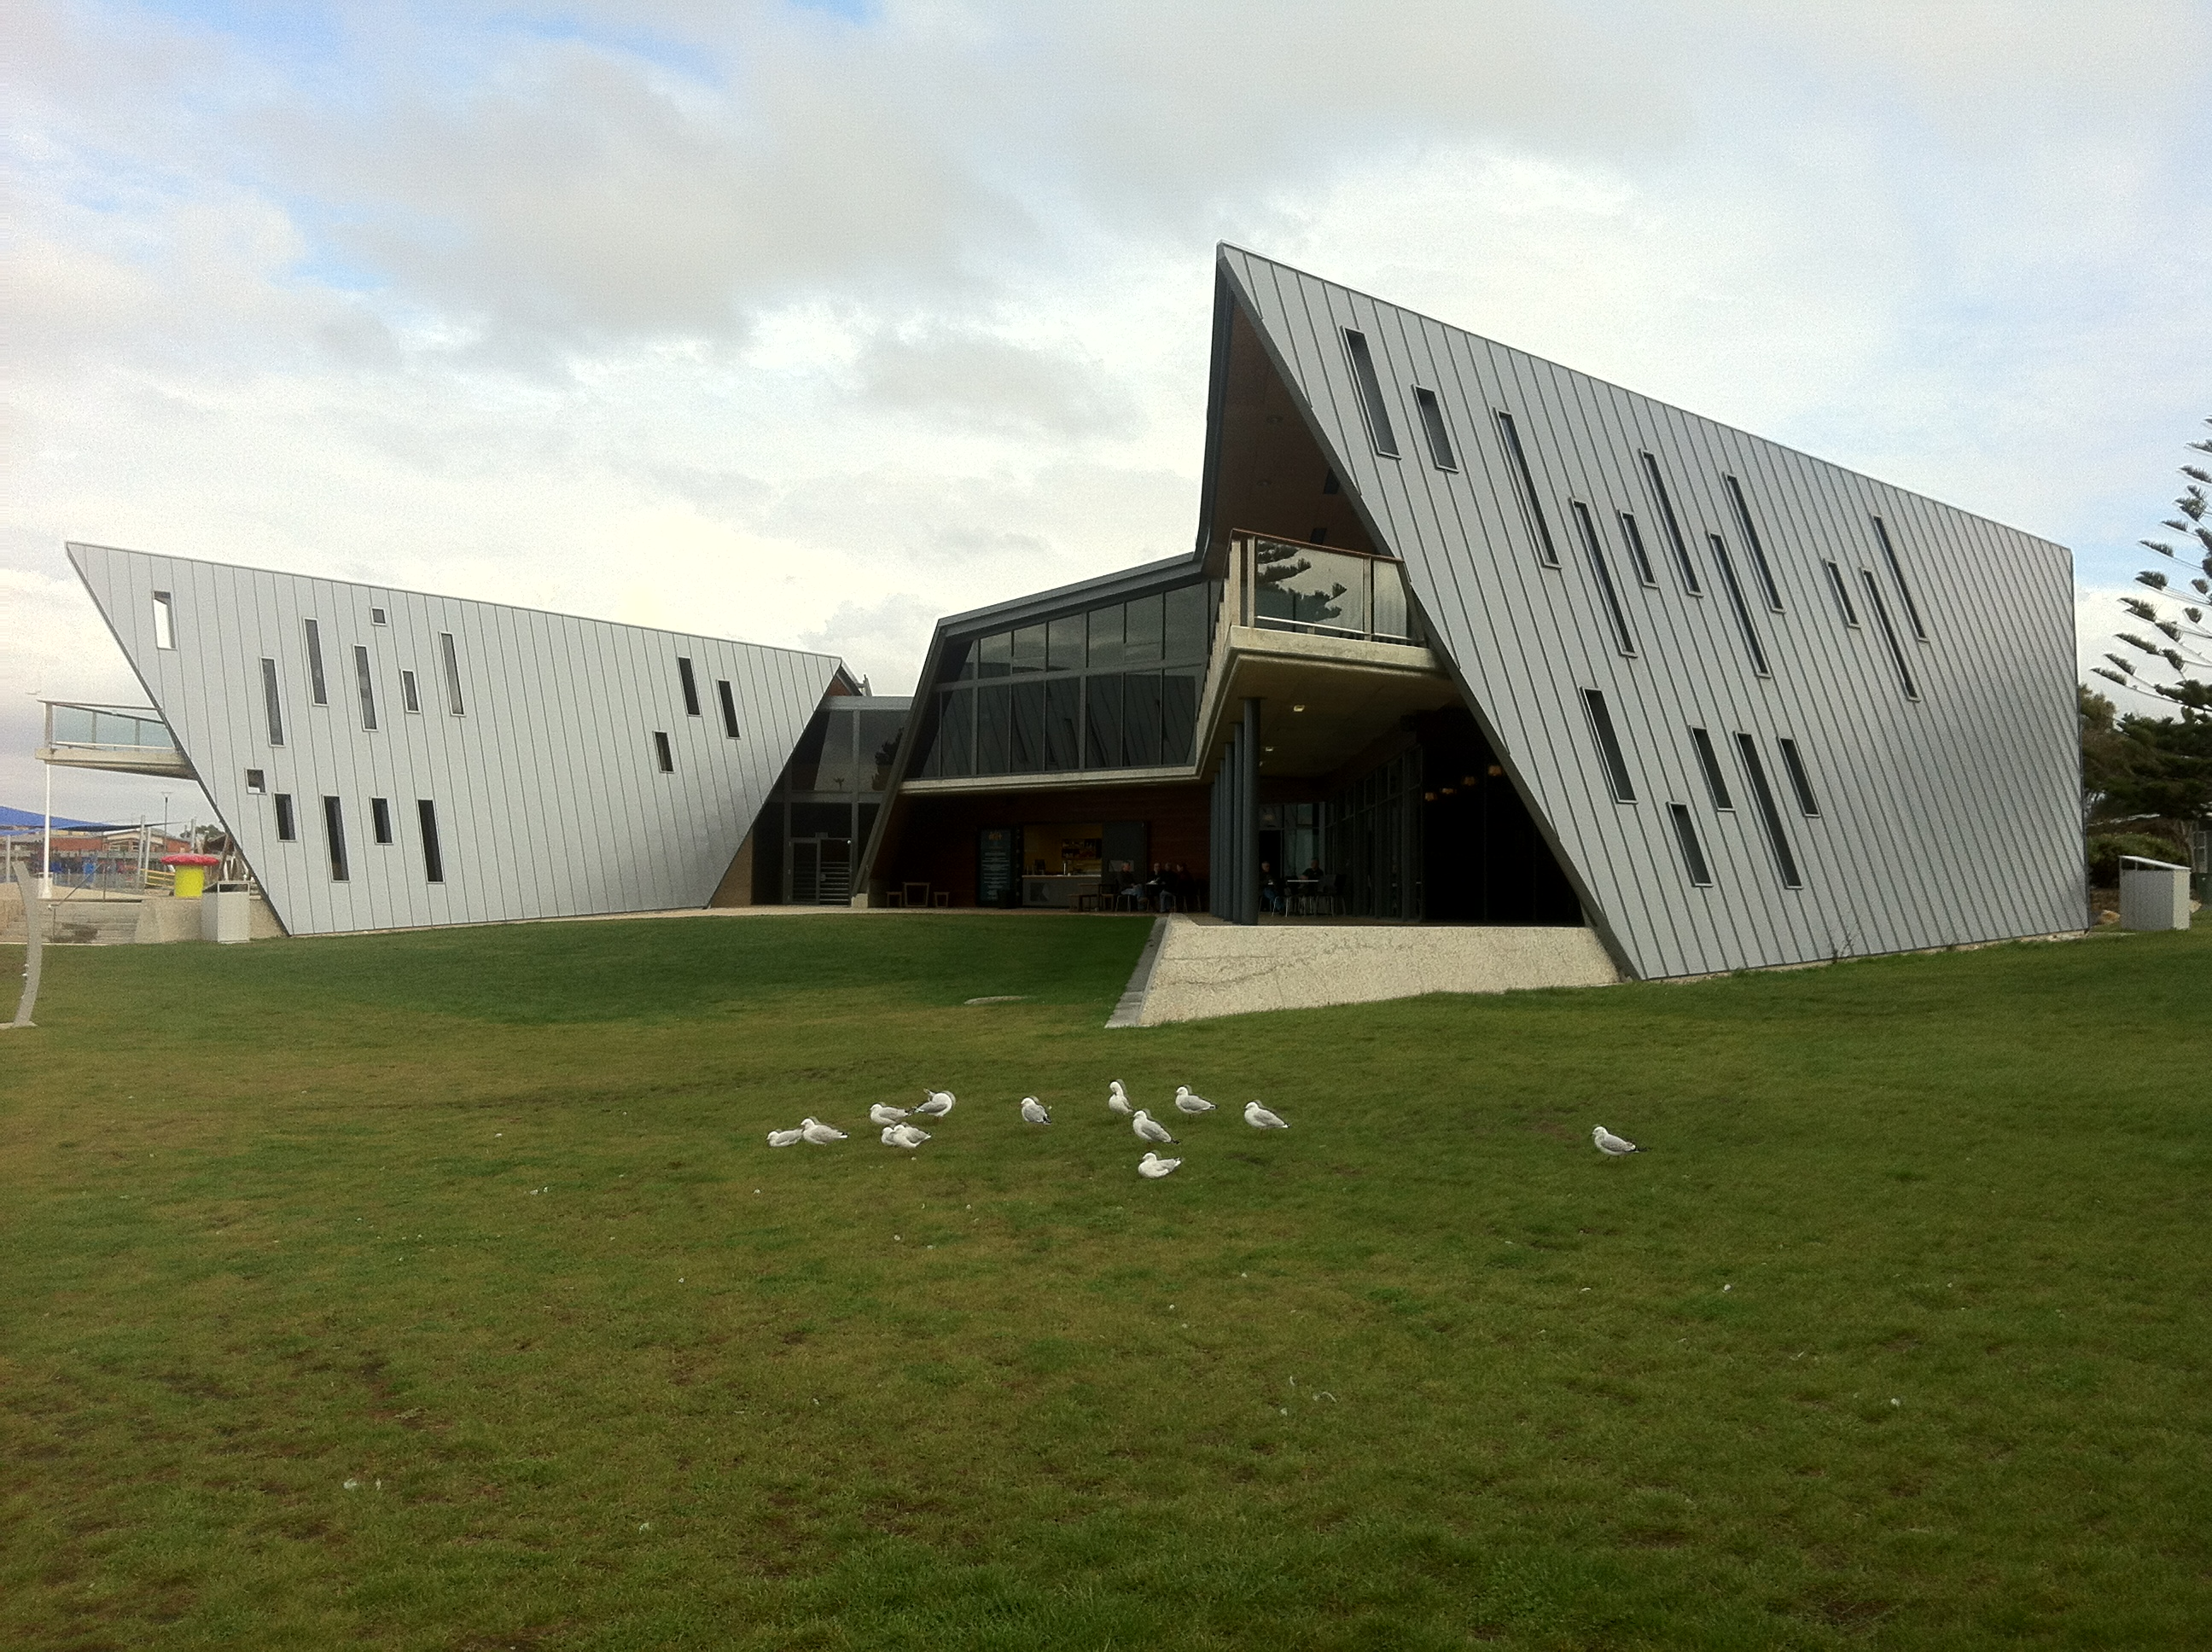 Roofing Gallery Stainless Steel Devonport Mersey